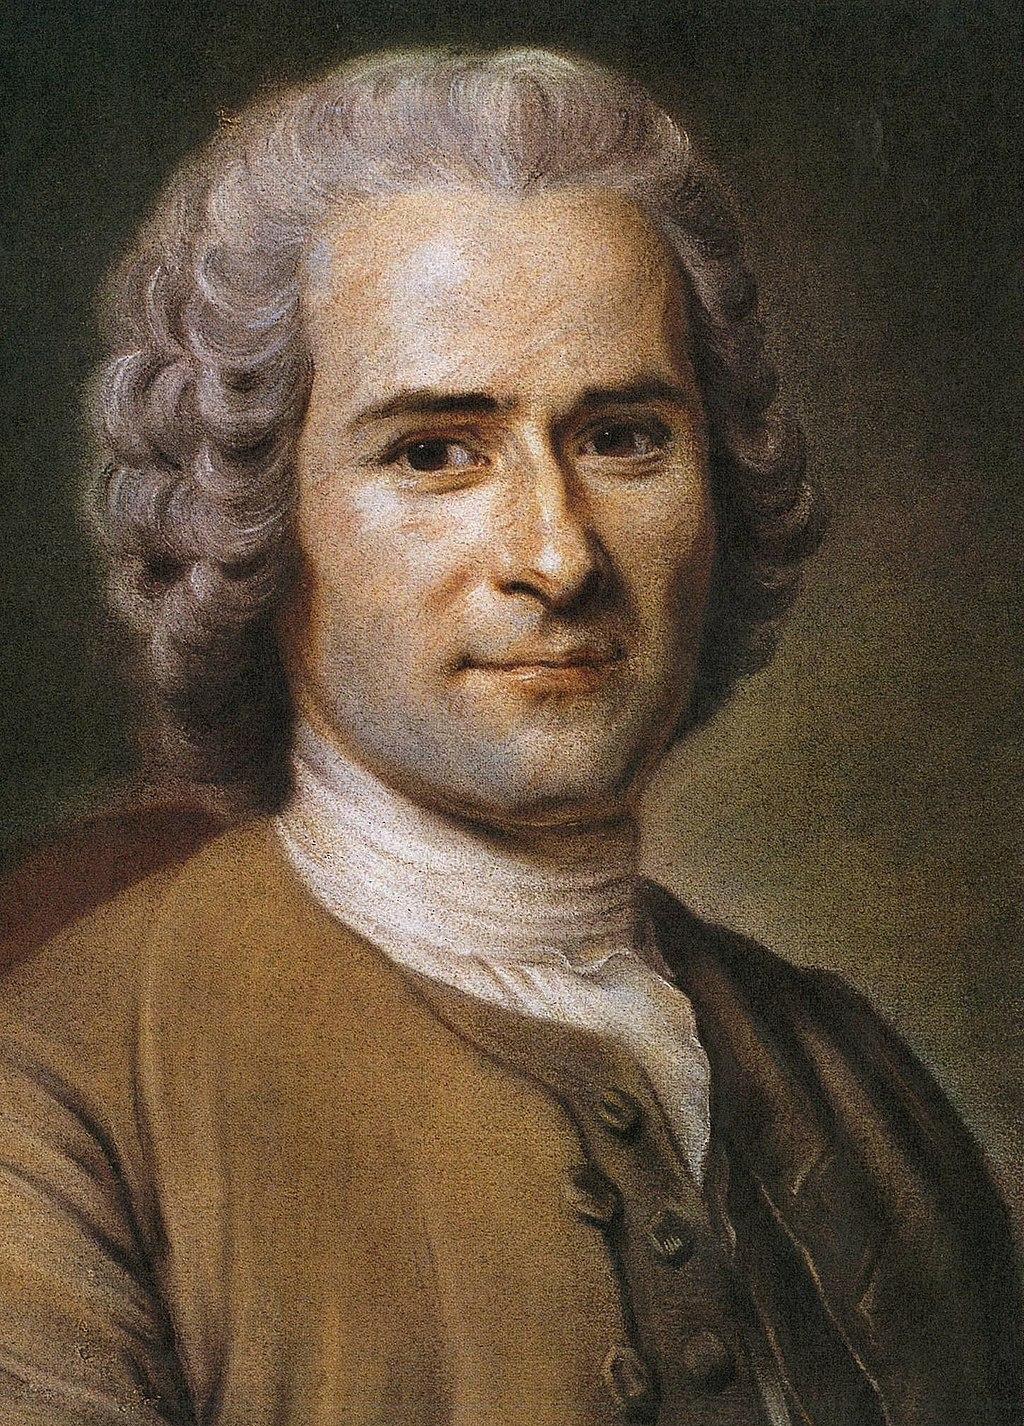 Portrait philosophe Rousseau coiffure regard